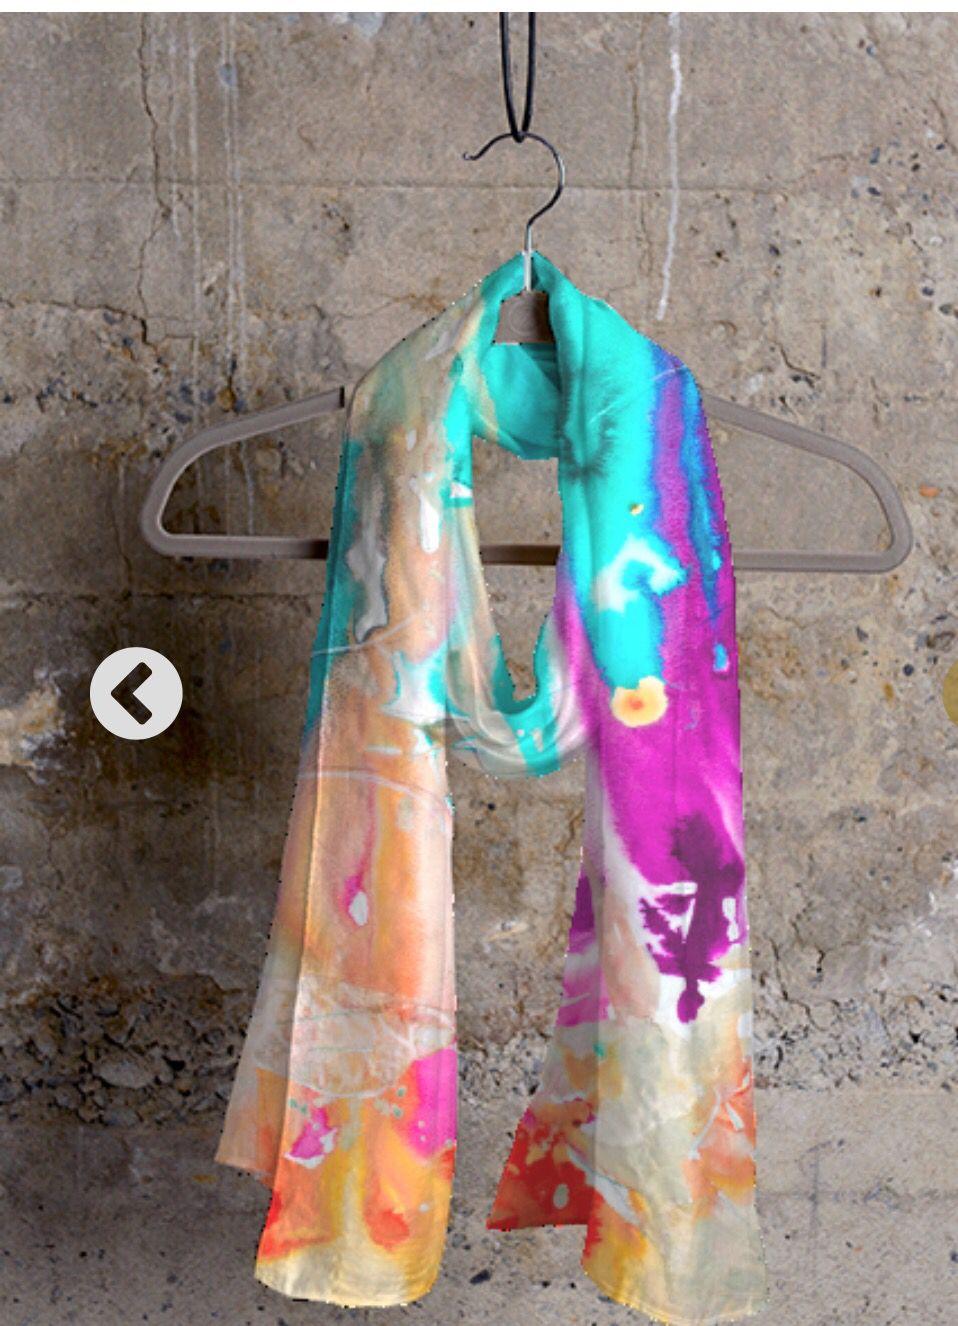 Cashmere Silk Scarf - Feel The Love Scarf by VIDA VIDA GabRpfaO9